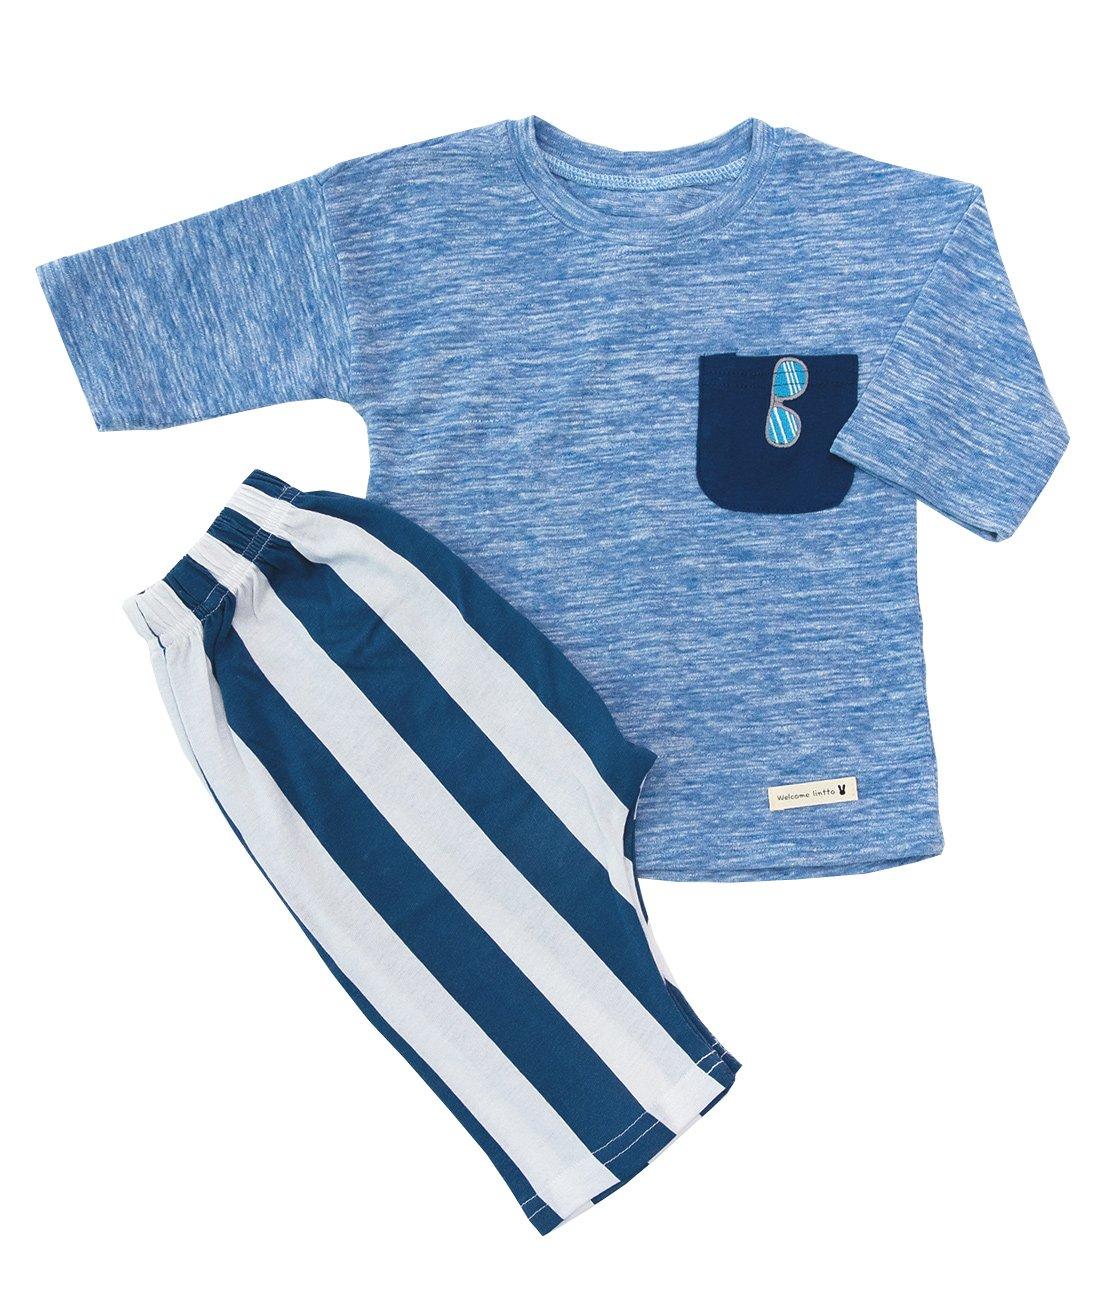 Lintto Pocket Sunglasses Embroidery Boys 2 Piece 3/4 Sleeves Pajama Set Cotton 100% Kids PJS Sleepwear (90(12-18M))